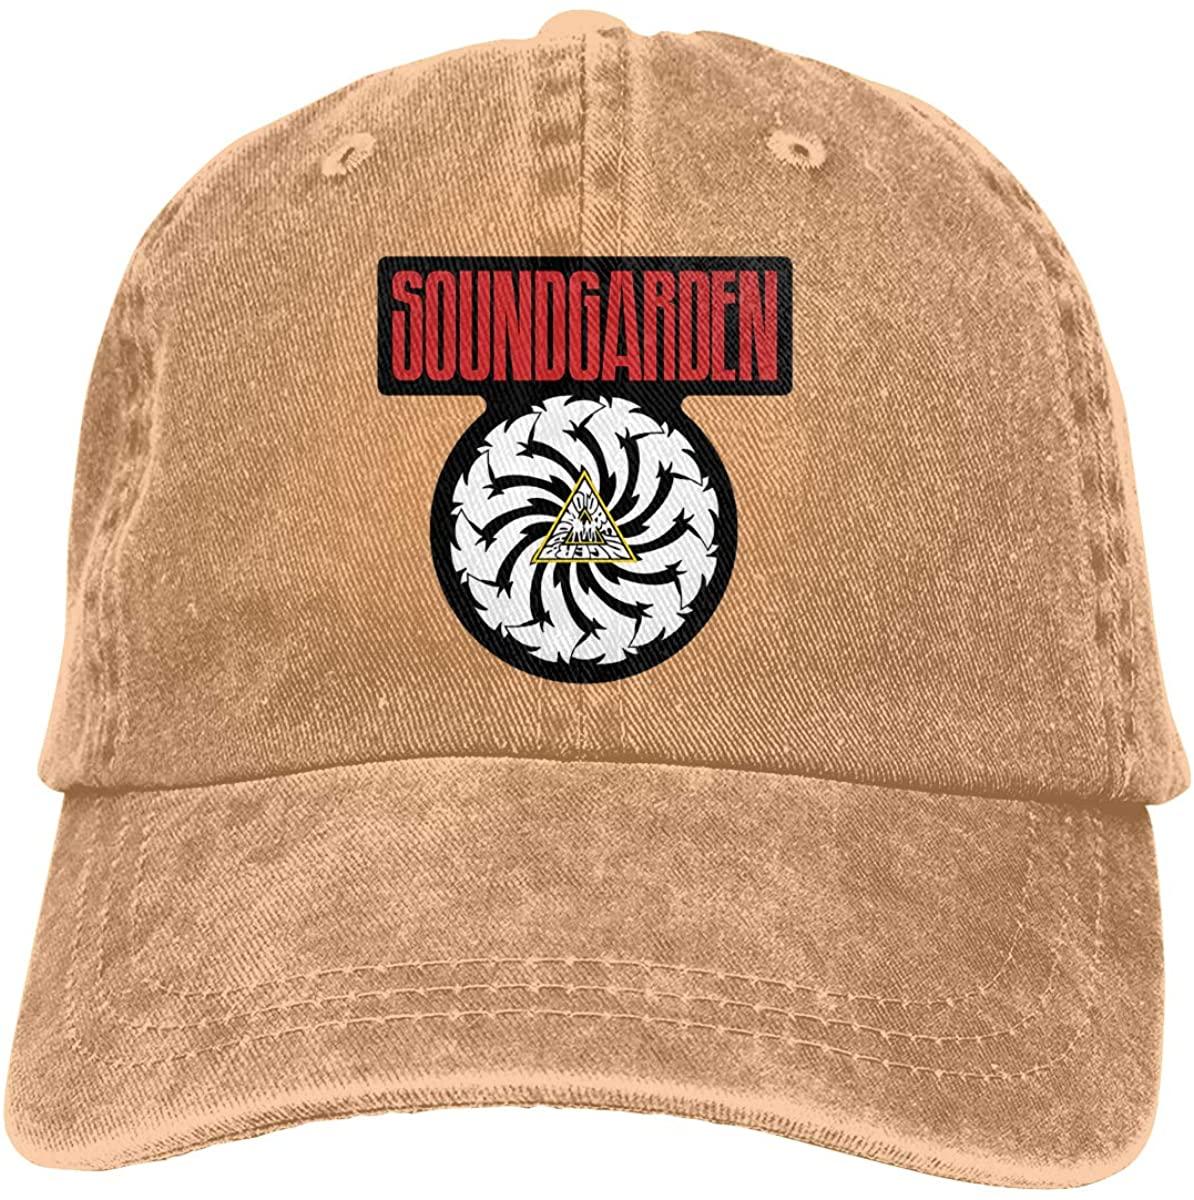 Zhejiangqingmenghuanji Sound_Garden Unisex Adult Adjustable Denim Cowboy Hat Casquette